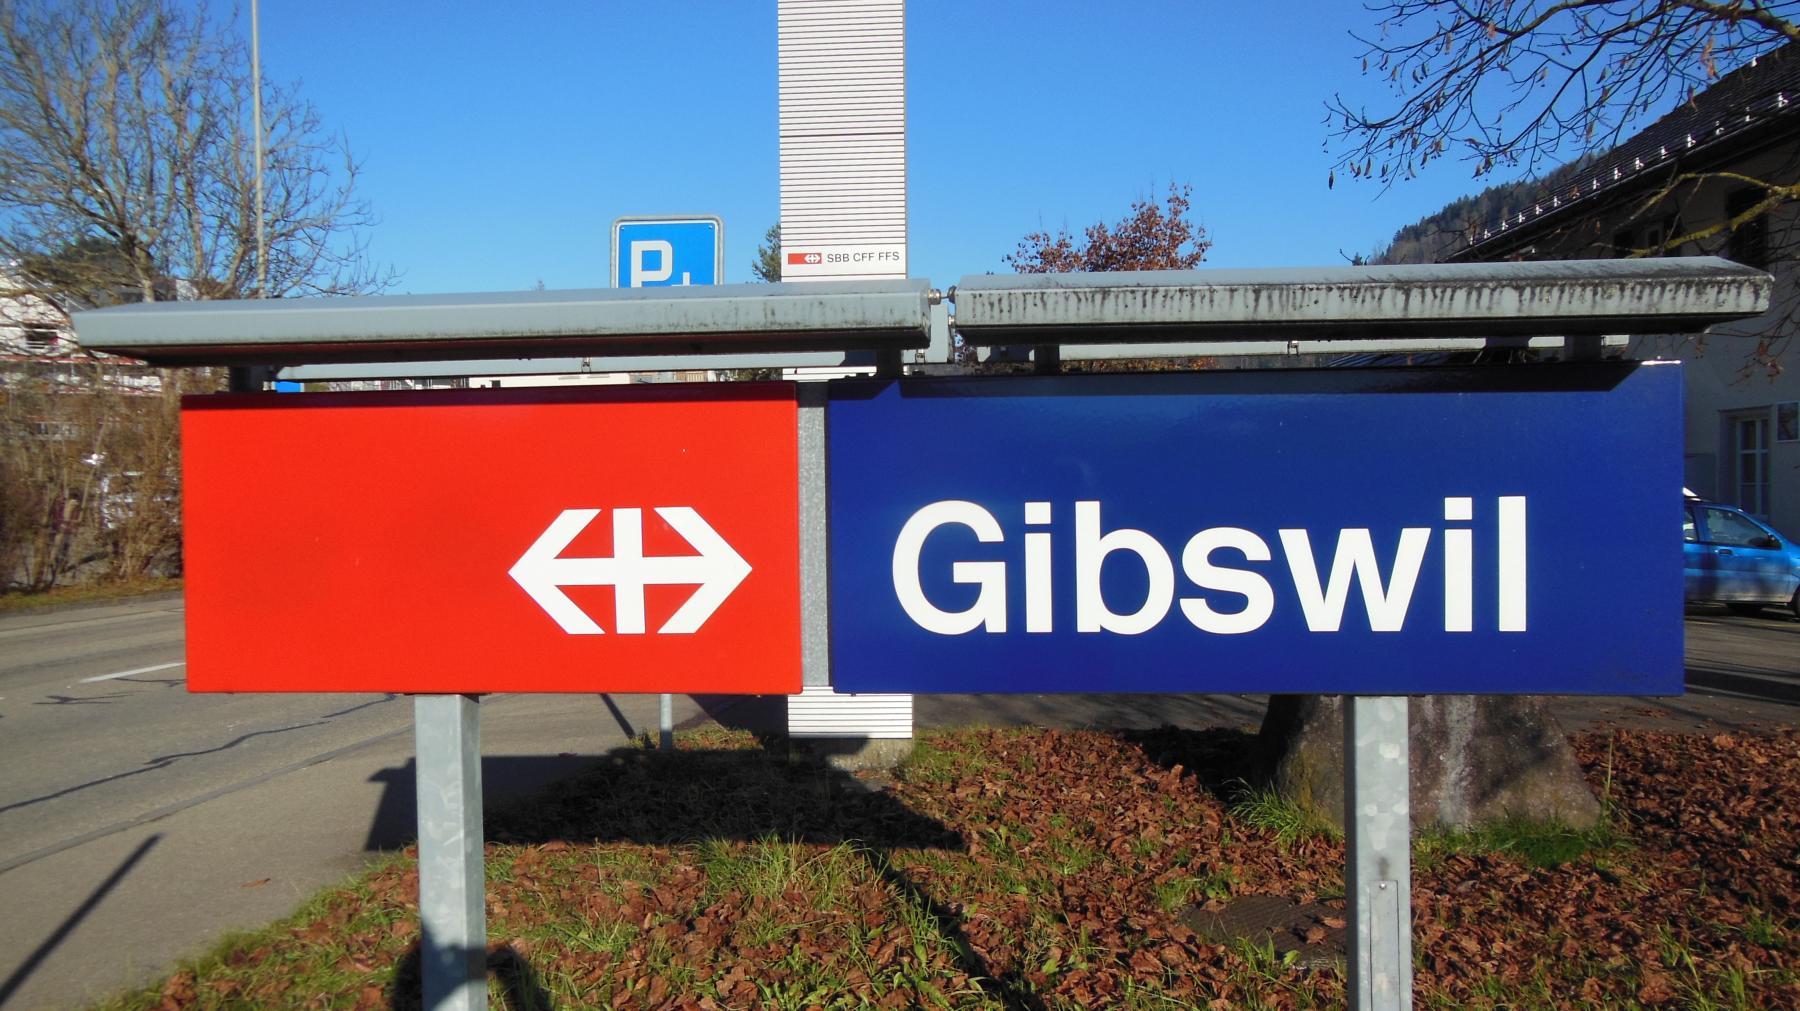 22 Gibswil Bahnhof